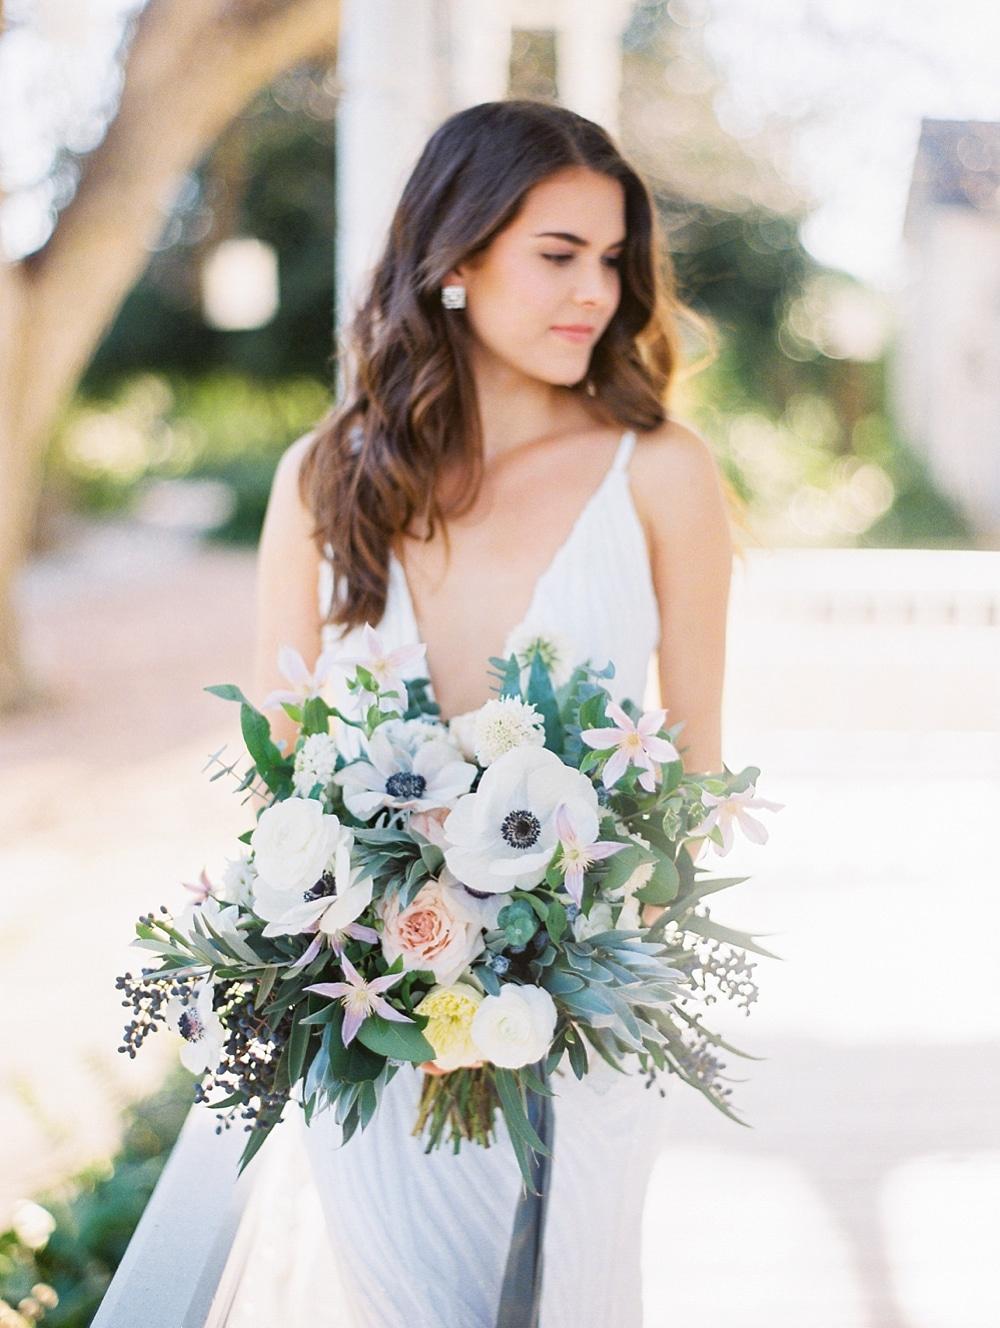 Kristin-La-Voie-Photography-Austin-Wedding-Photographer-barr-mansion (5 of 86)